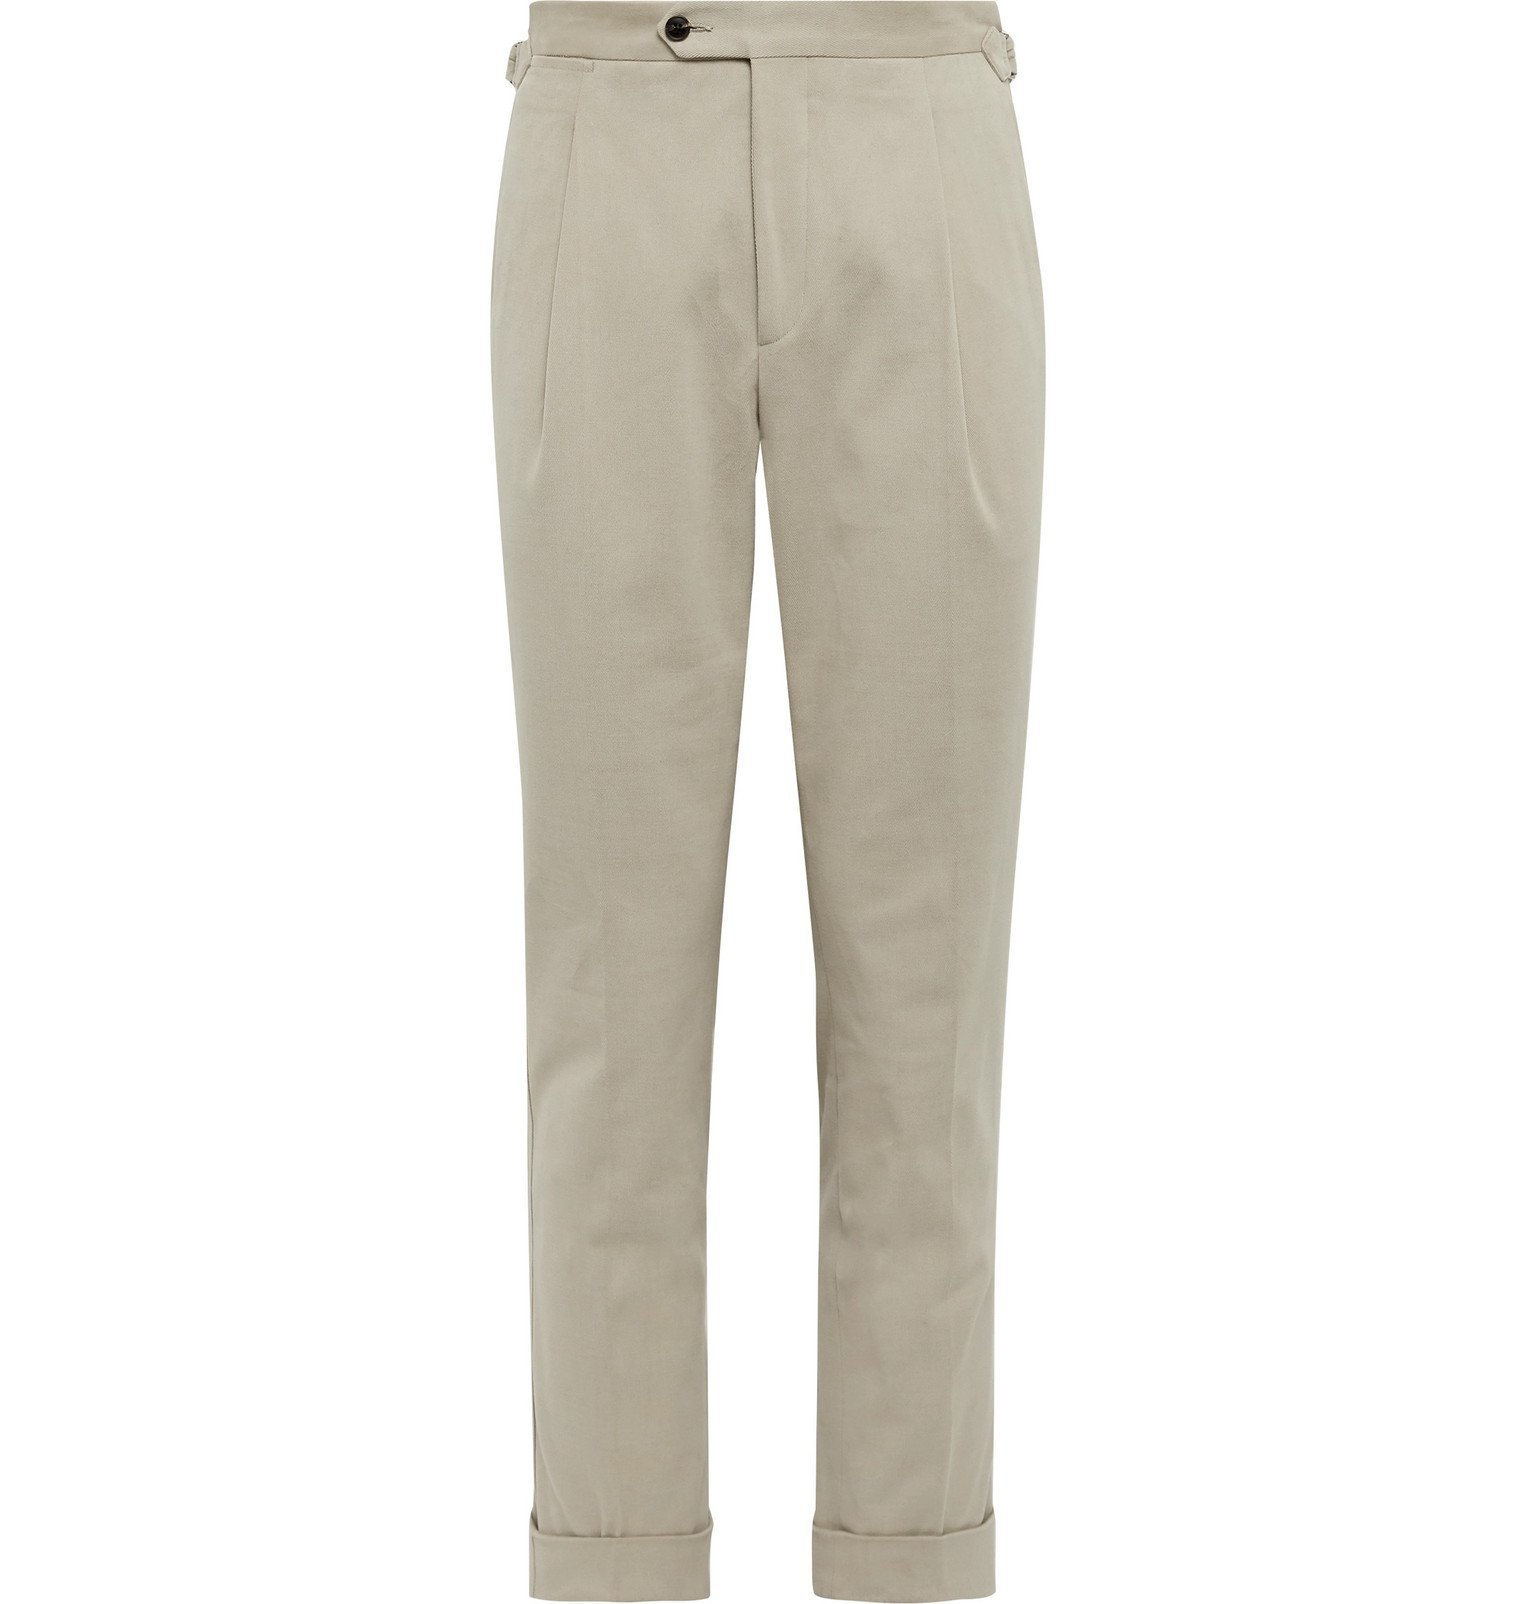 Saman Amel - Beige Pleated Wool-Twill Trousers - Neutrals